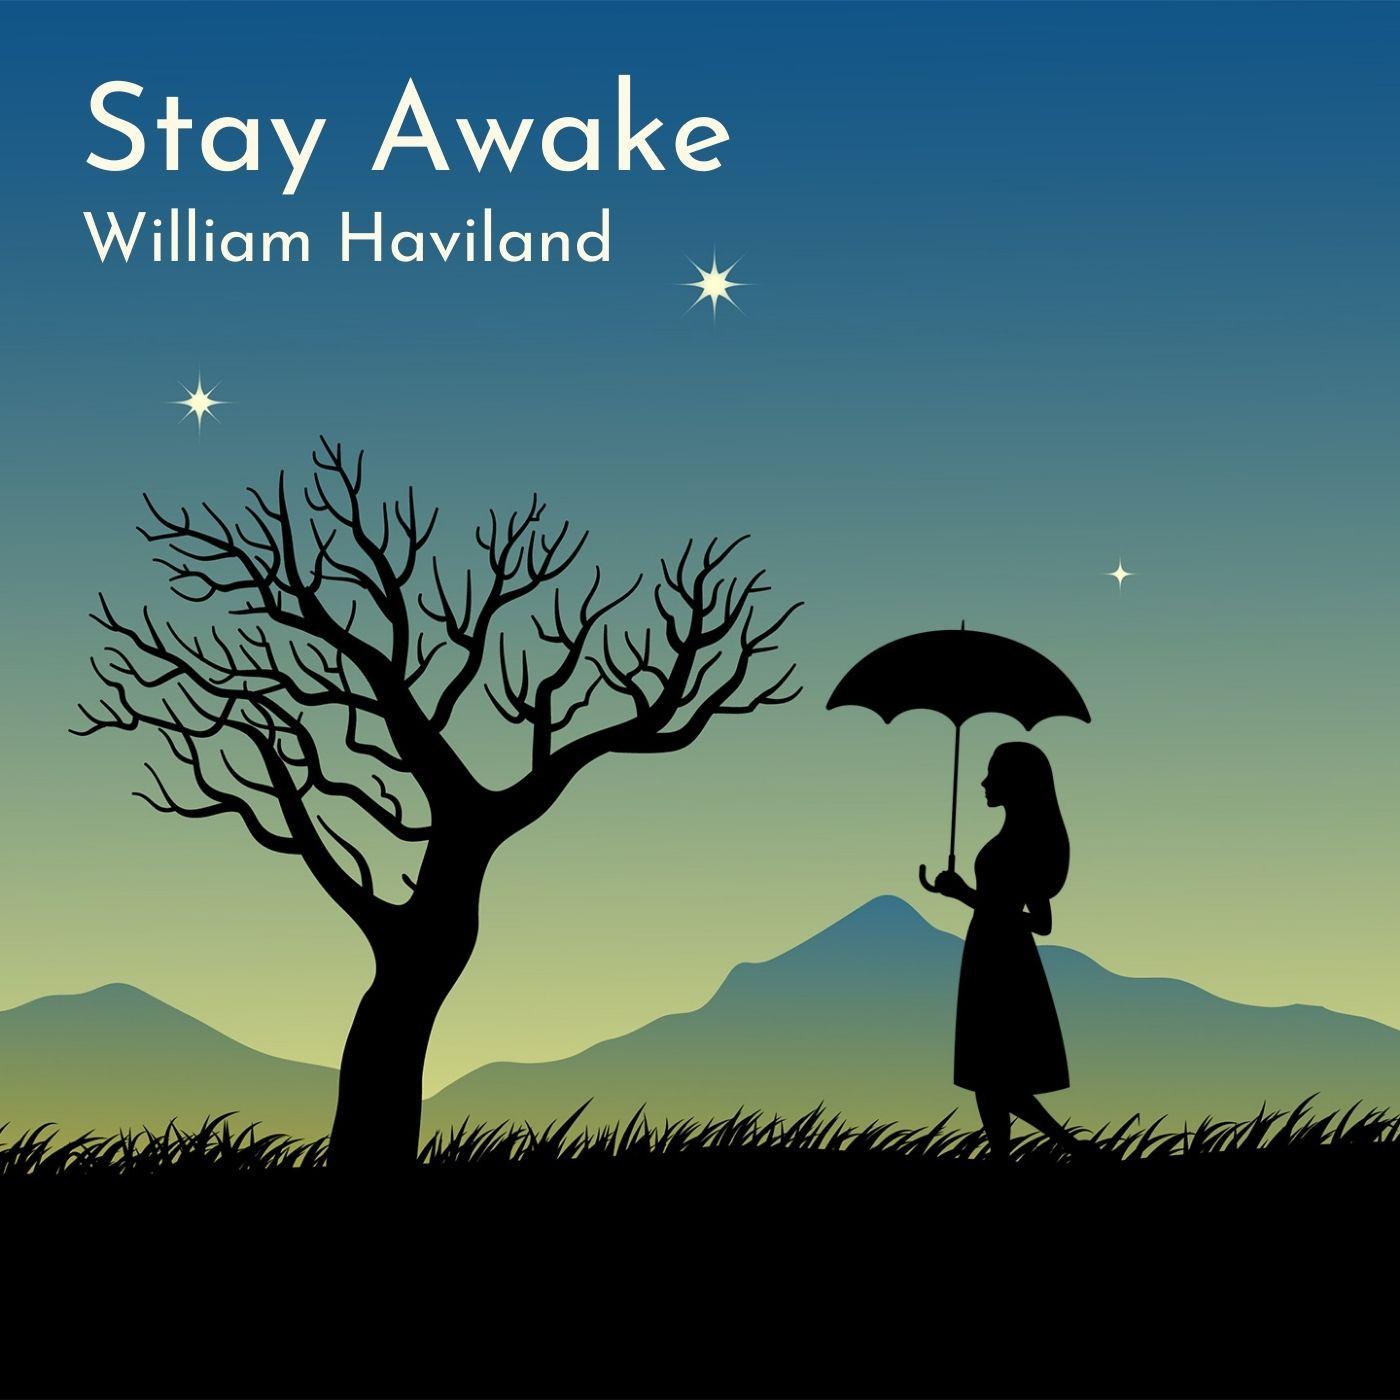 Stay Awake (Piano Version)